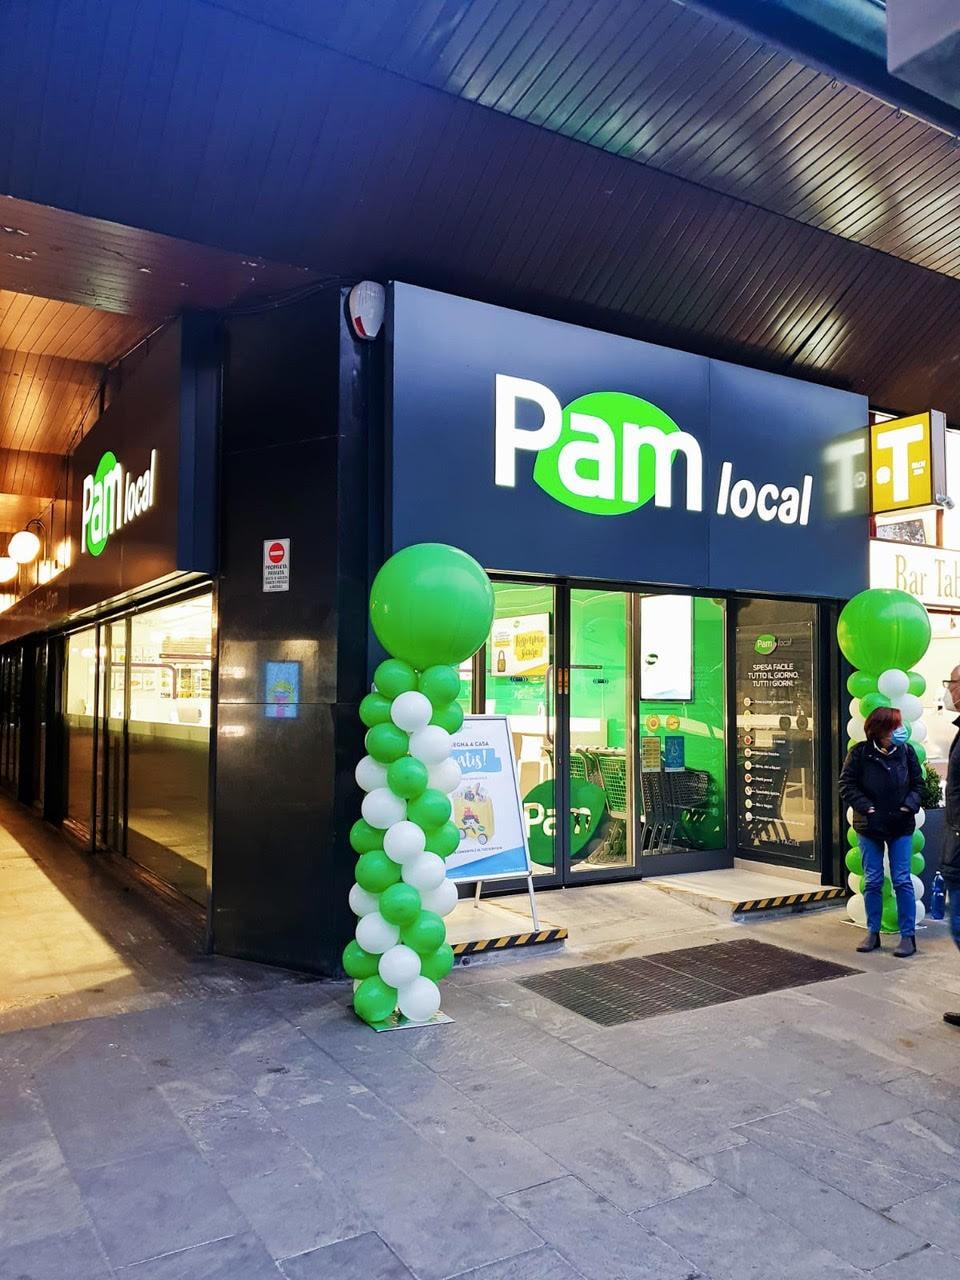 Pam local si espande a Milano